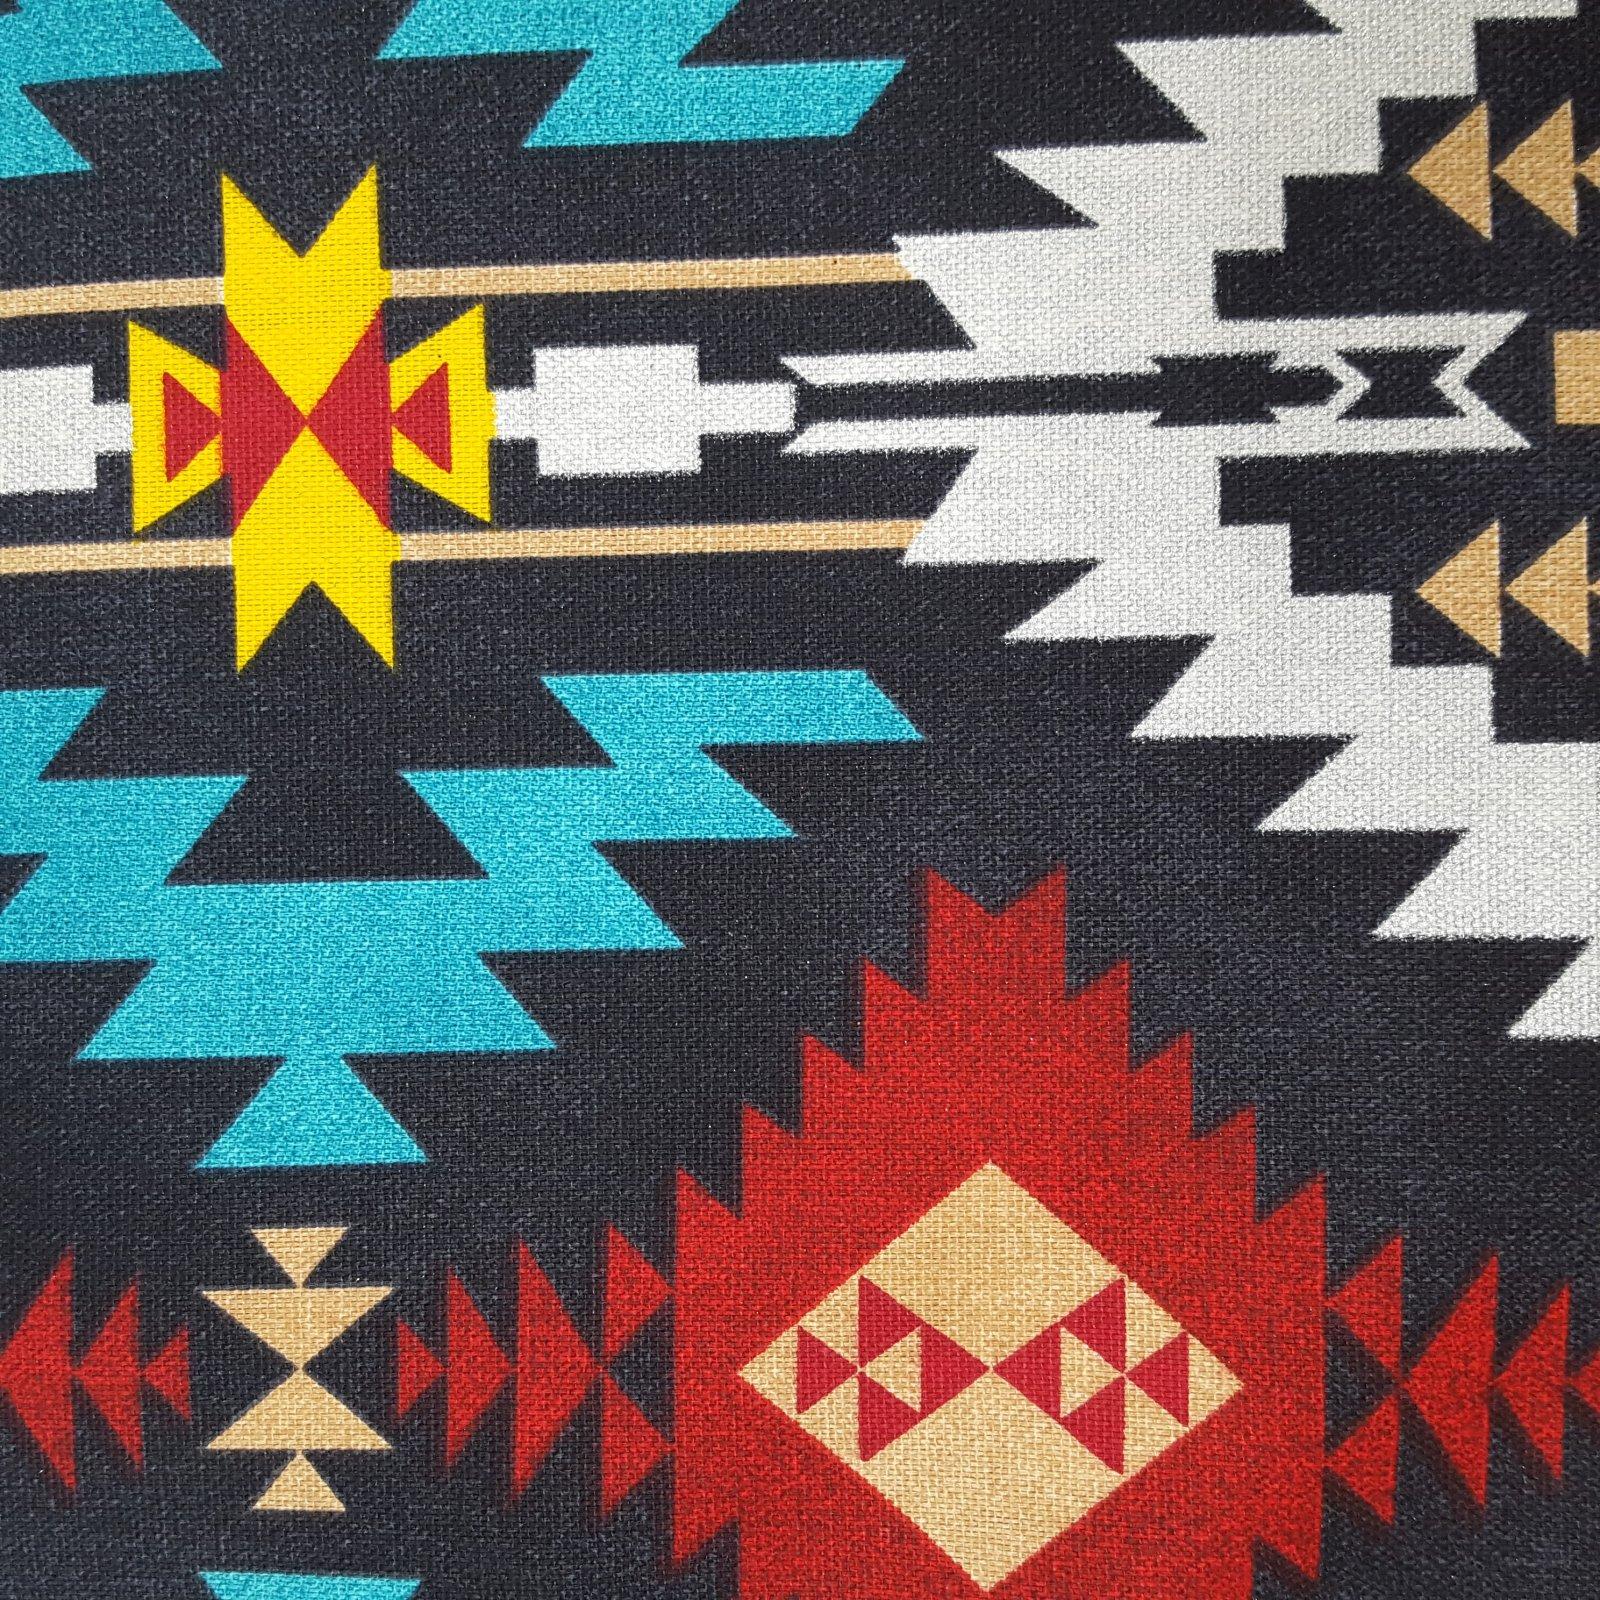 Cotton Prints 43830-5 - Native Charcoal